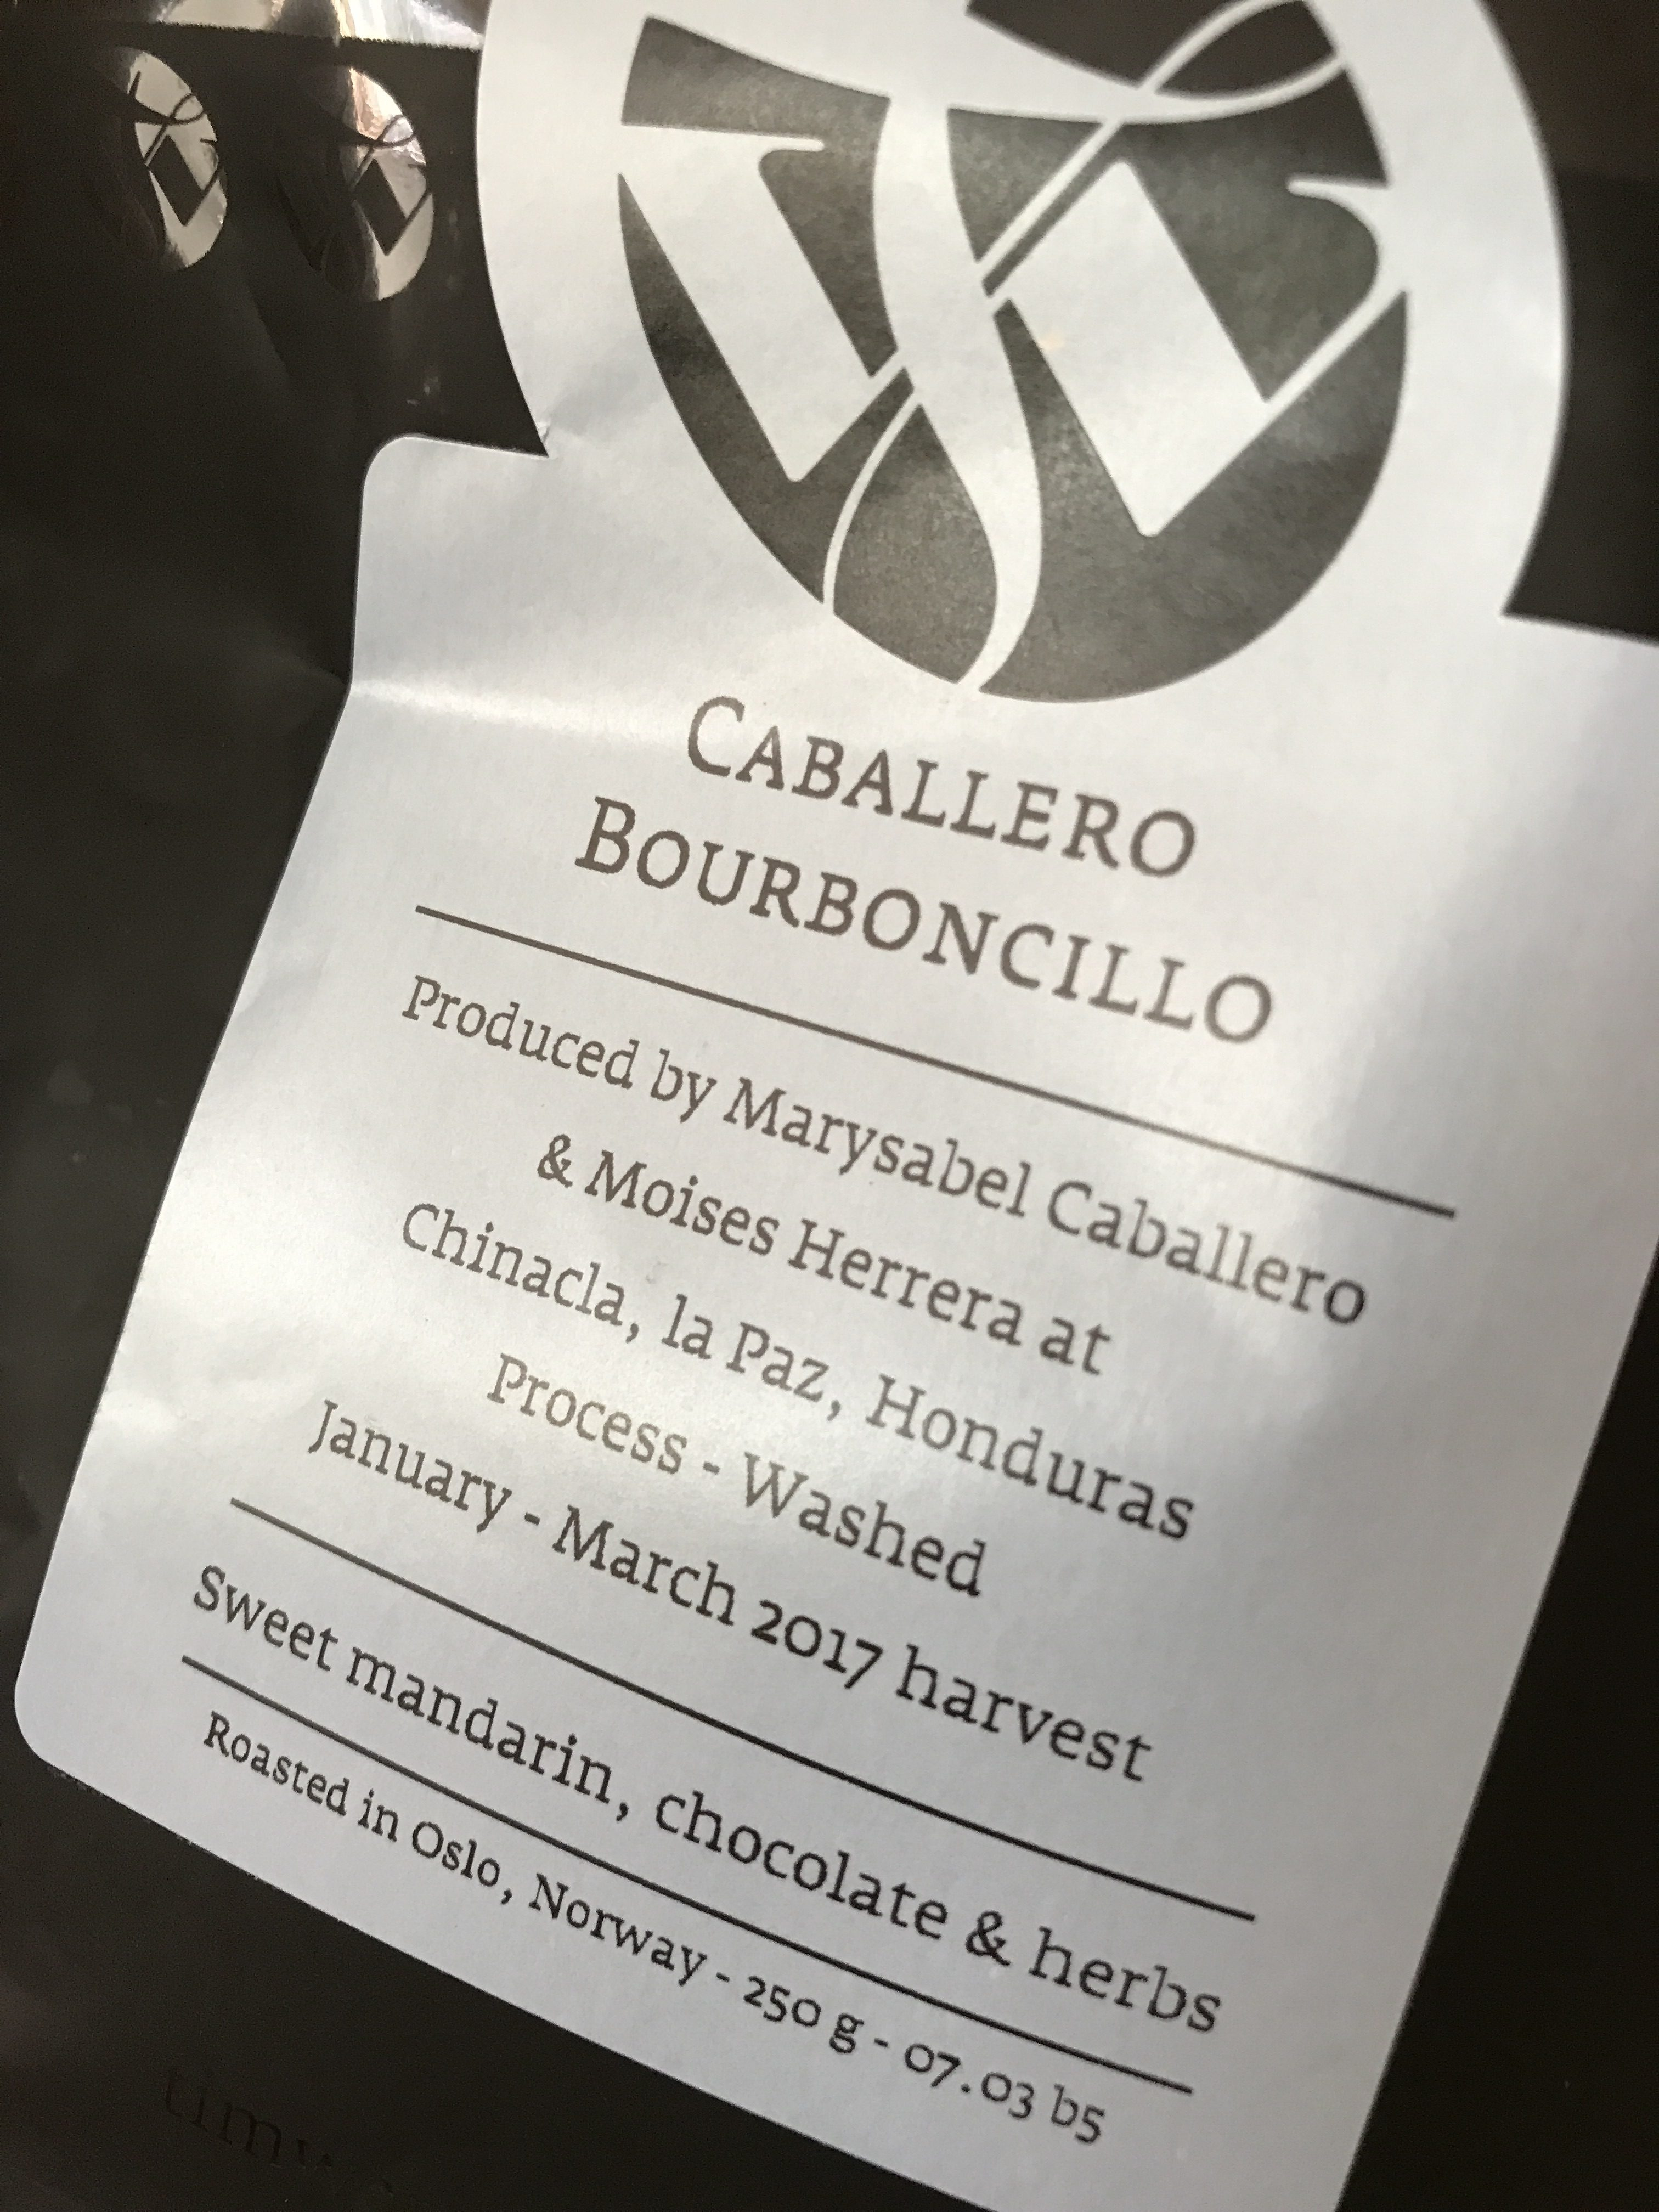 Tim Wendelboe Caballero Bourboncillo